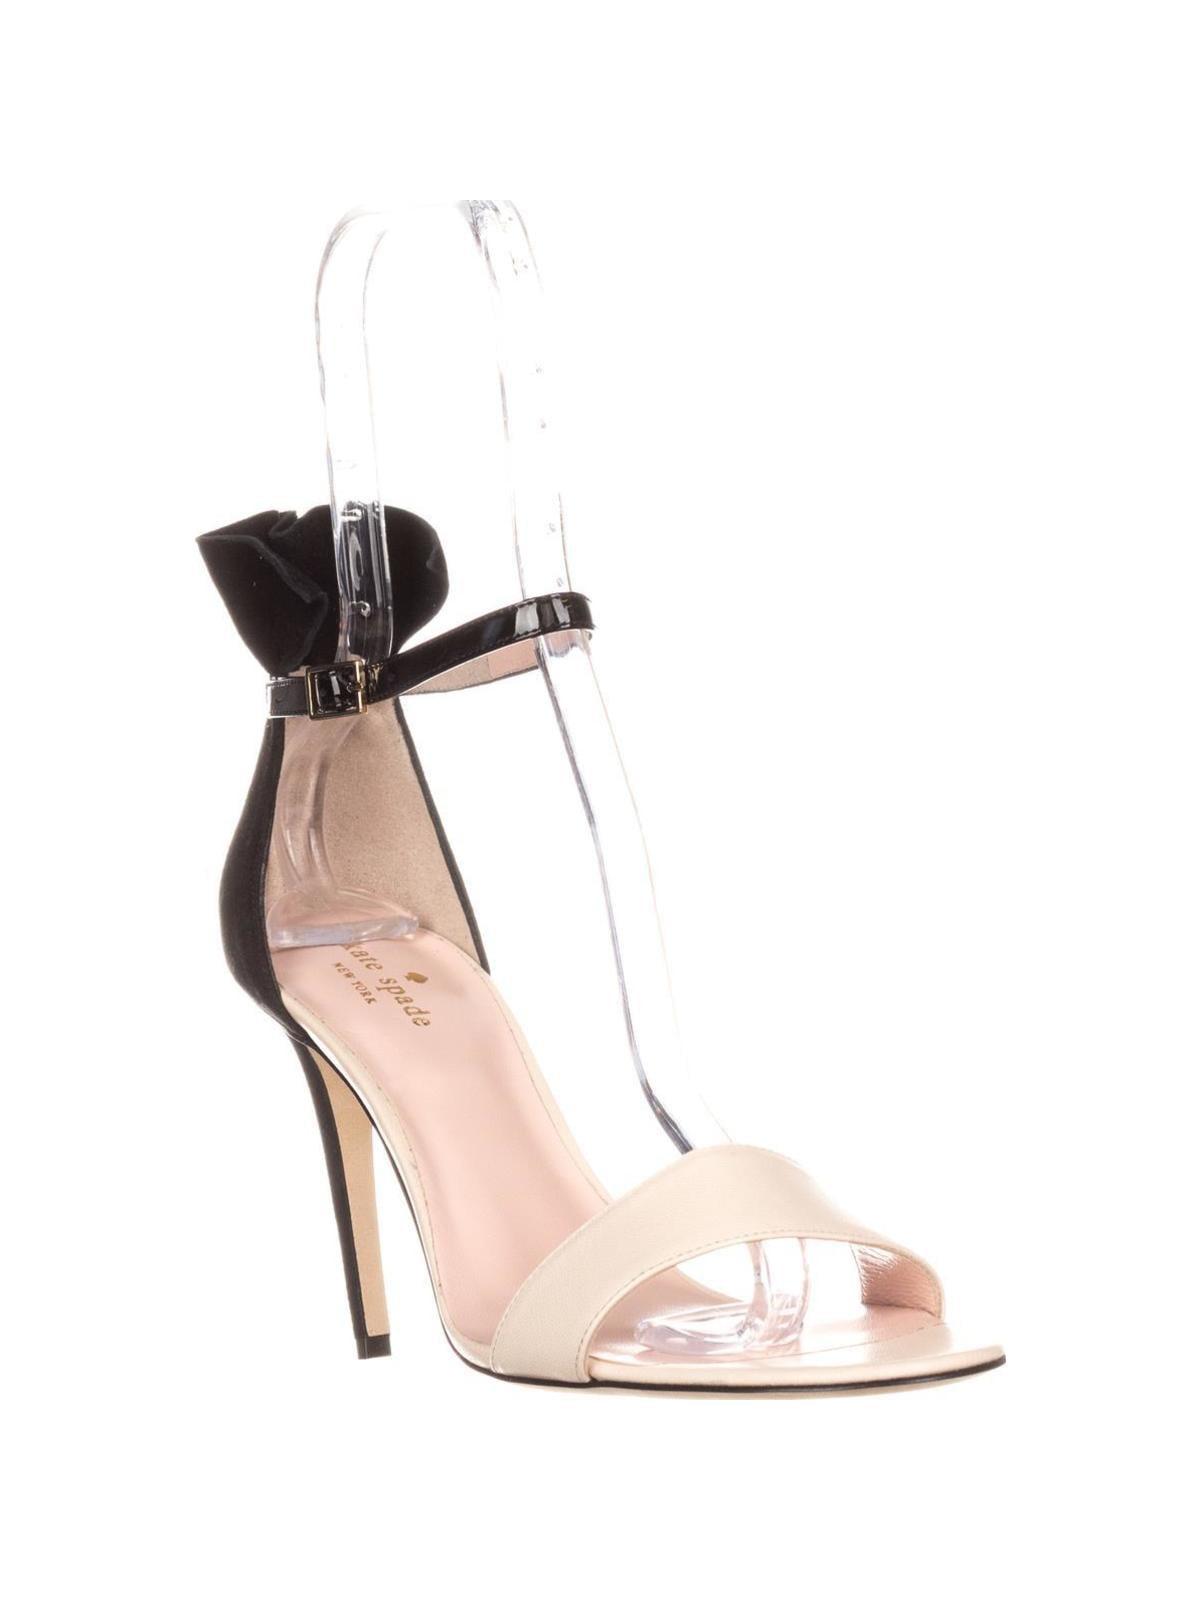 e570058a6f9dfb Kate spade new york iris ankle strap dress sandals nude black patent jpg  1200x1600 Kate spade